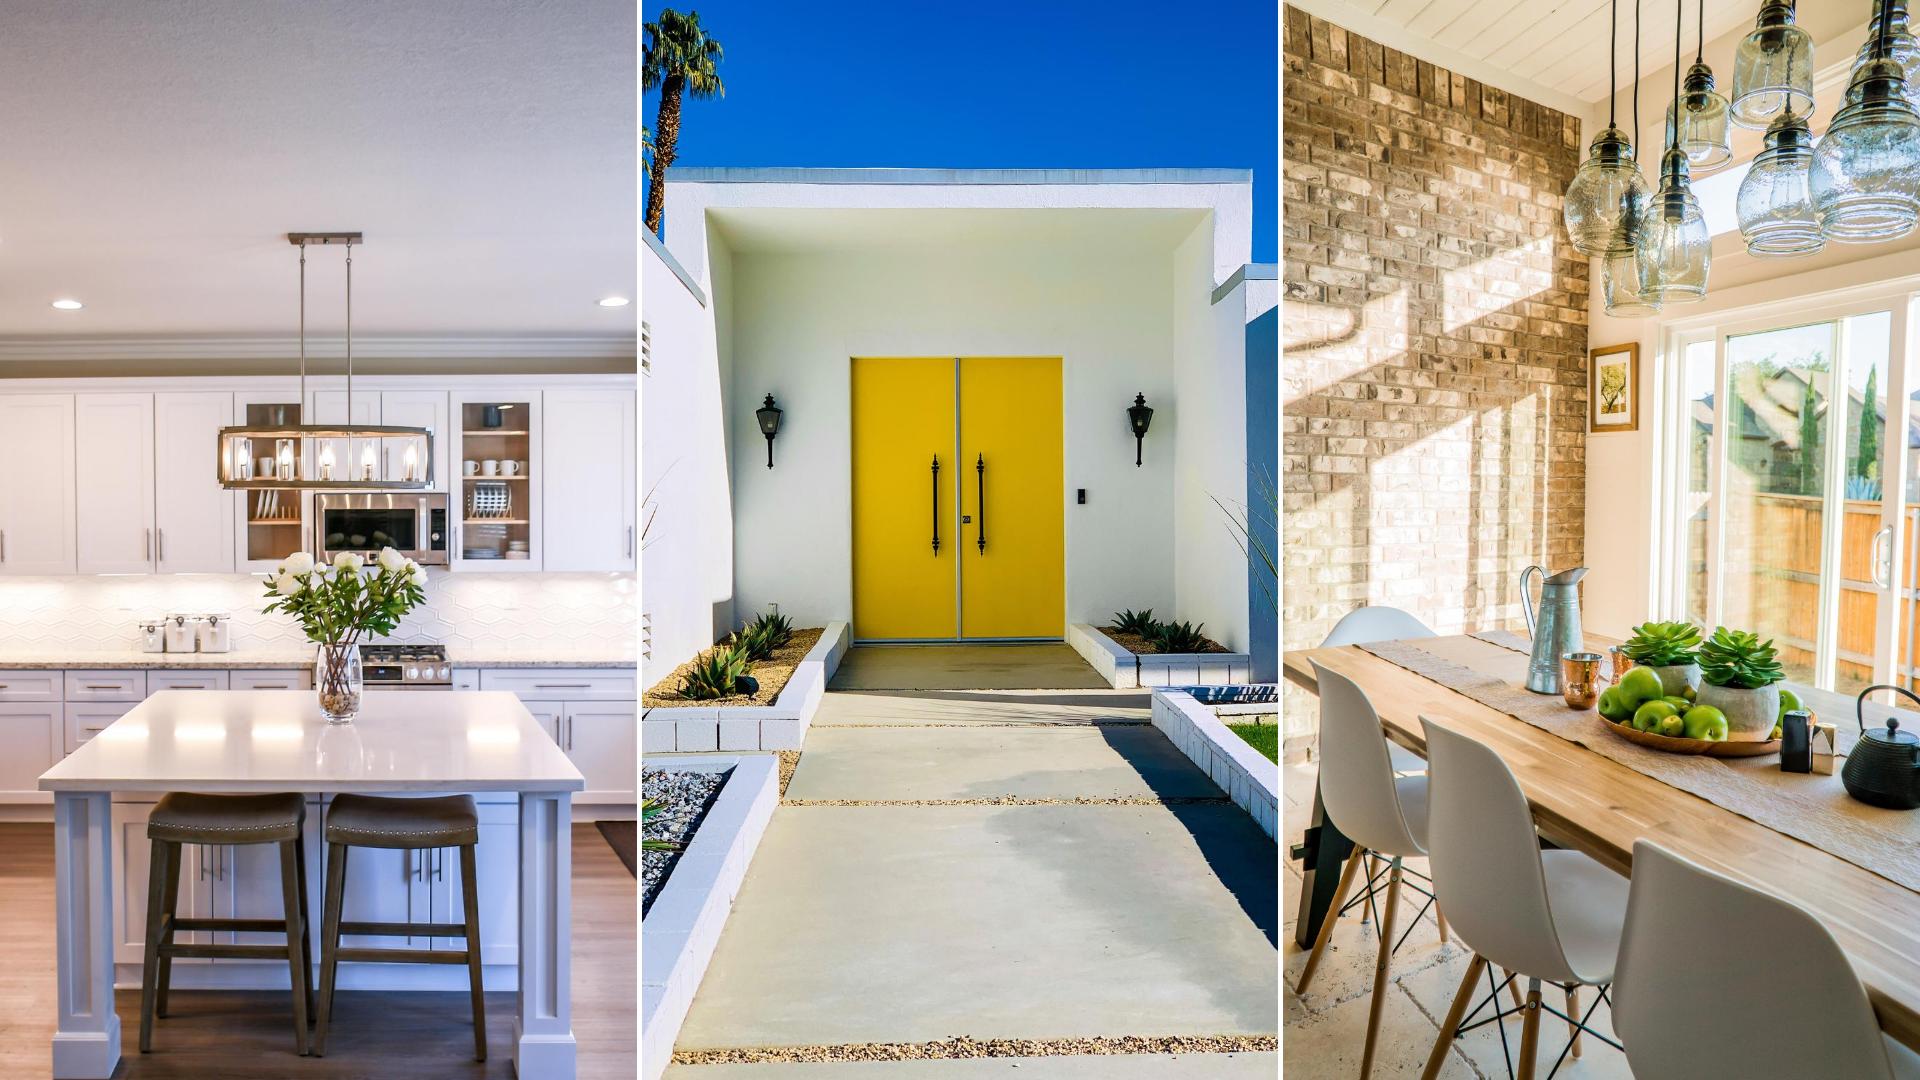 camarillo california real estate